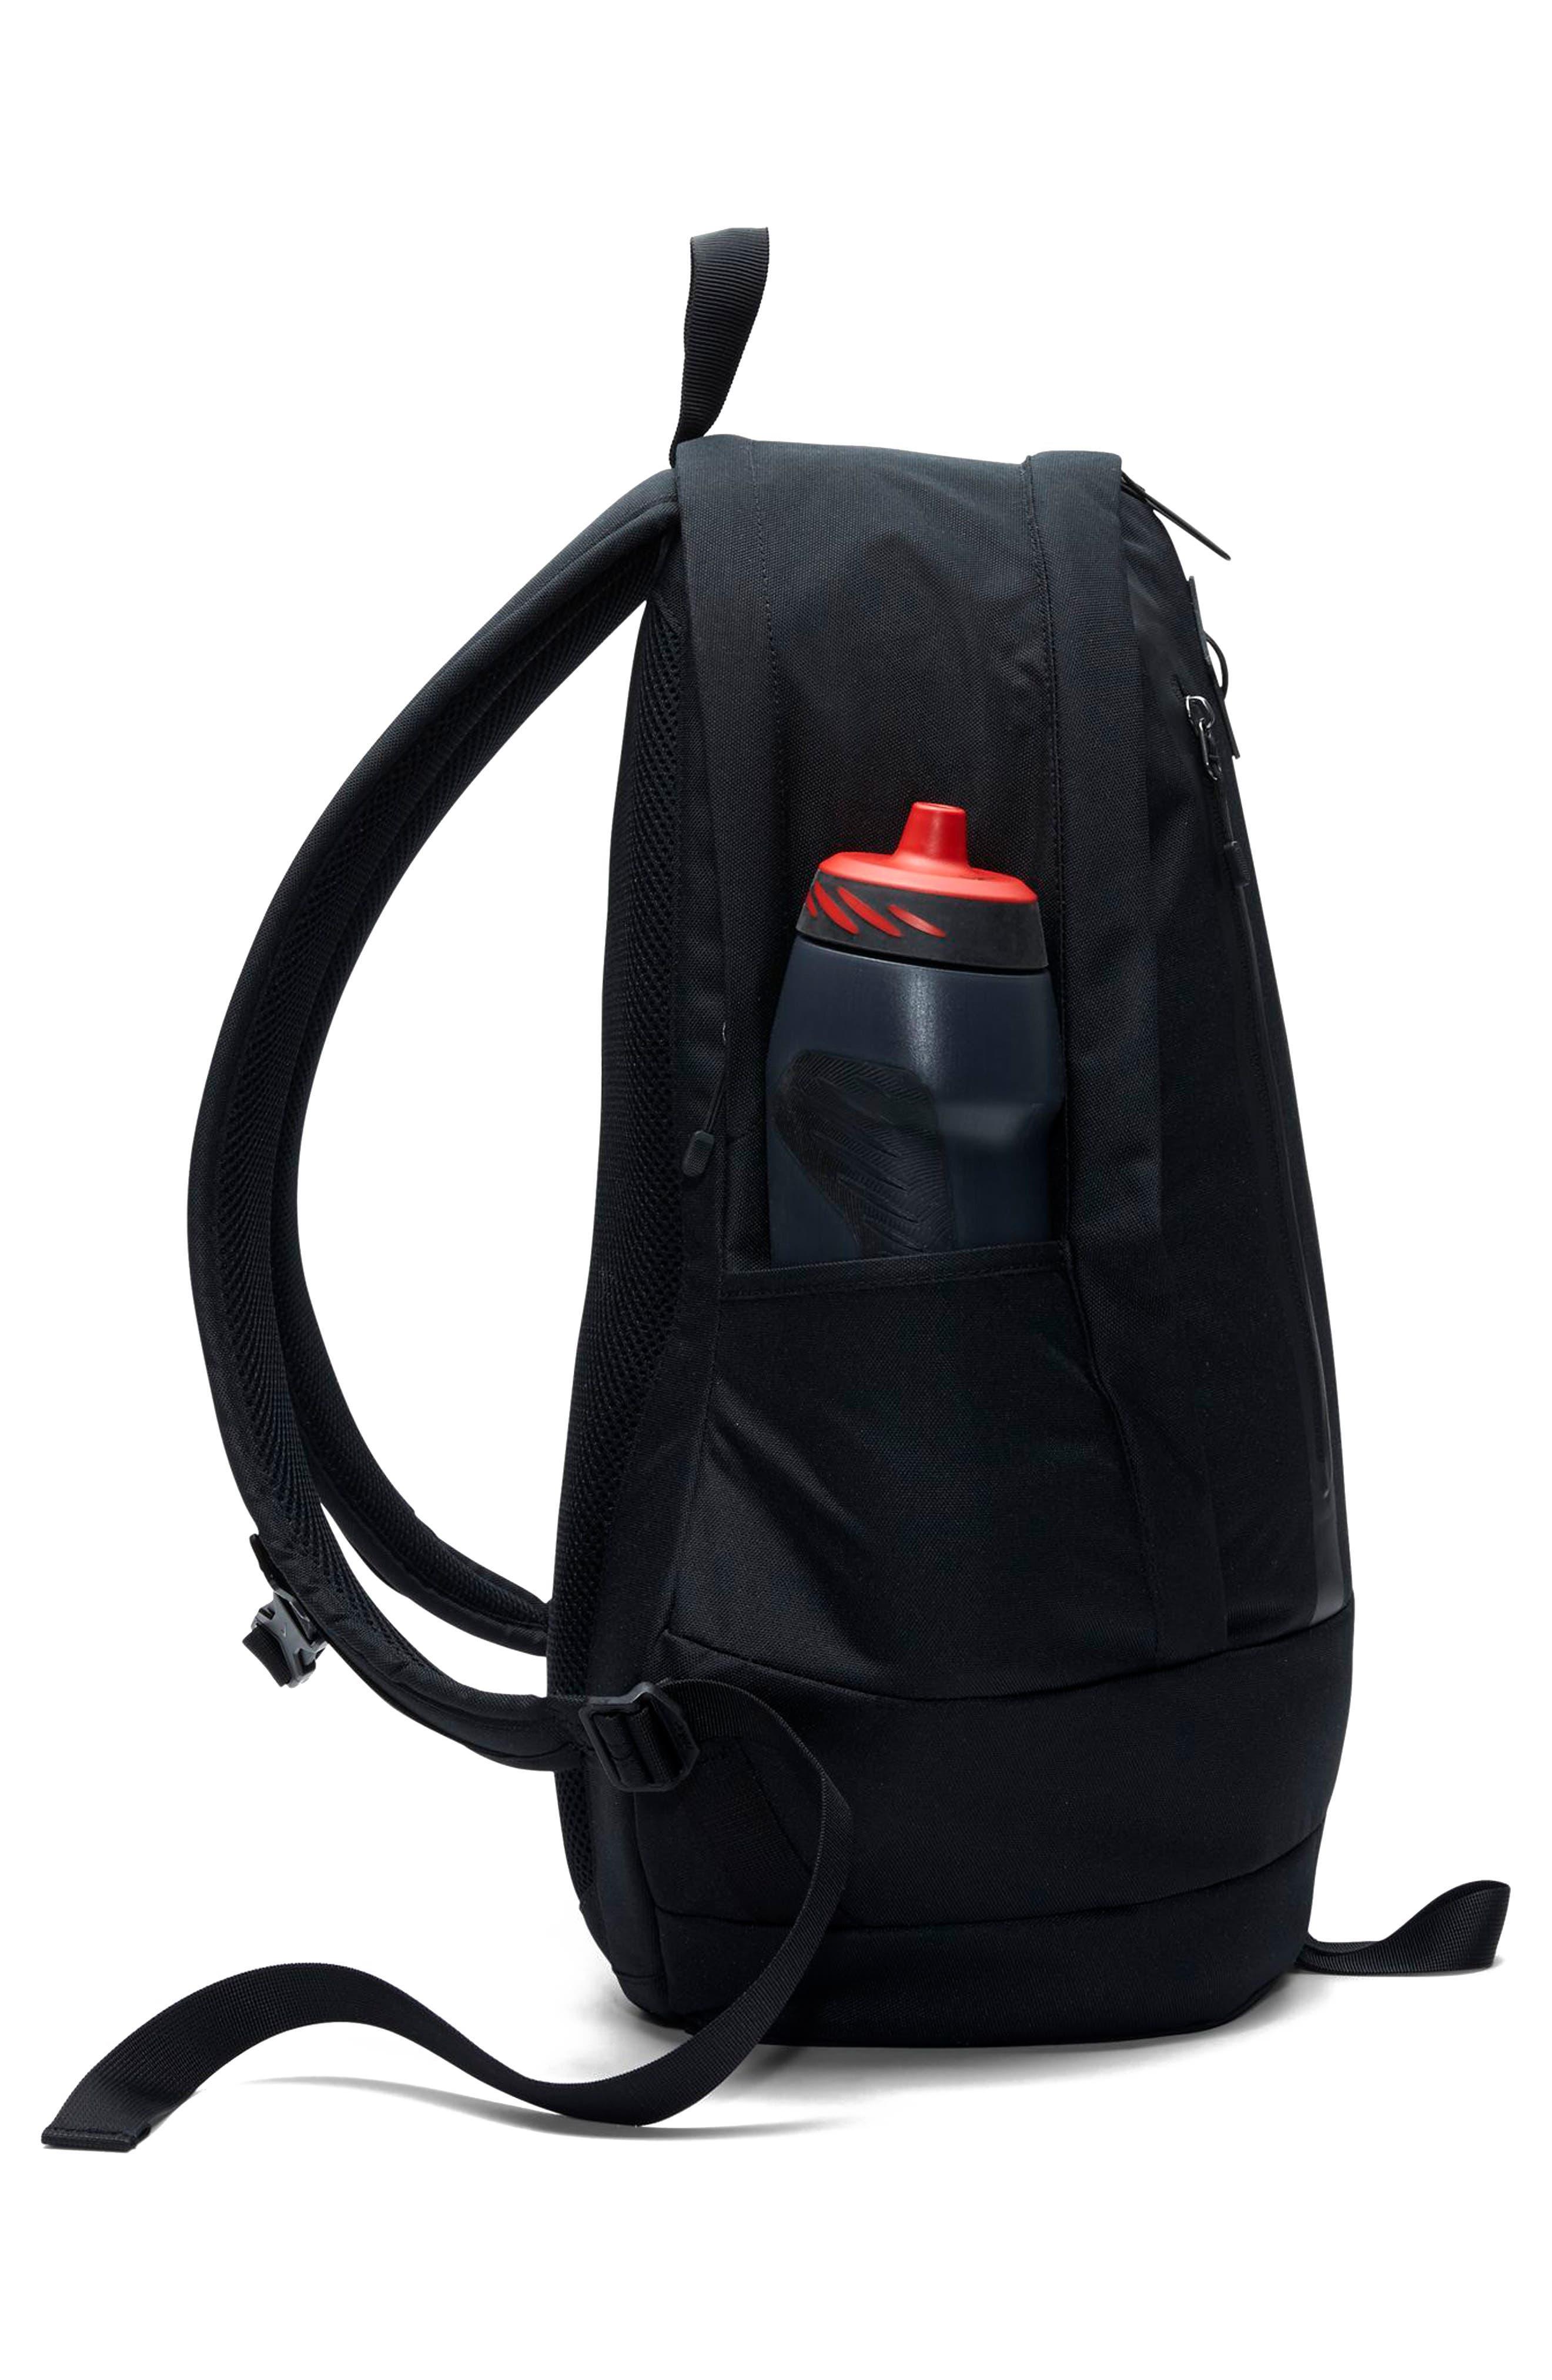 Cheyenne Backpack,                             Alternate thumbnail 3, color,                             Black/ Black/ Black